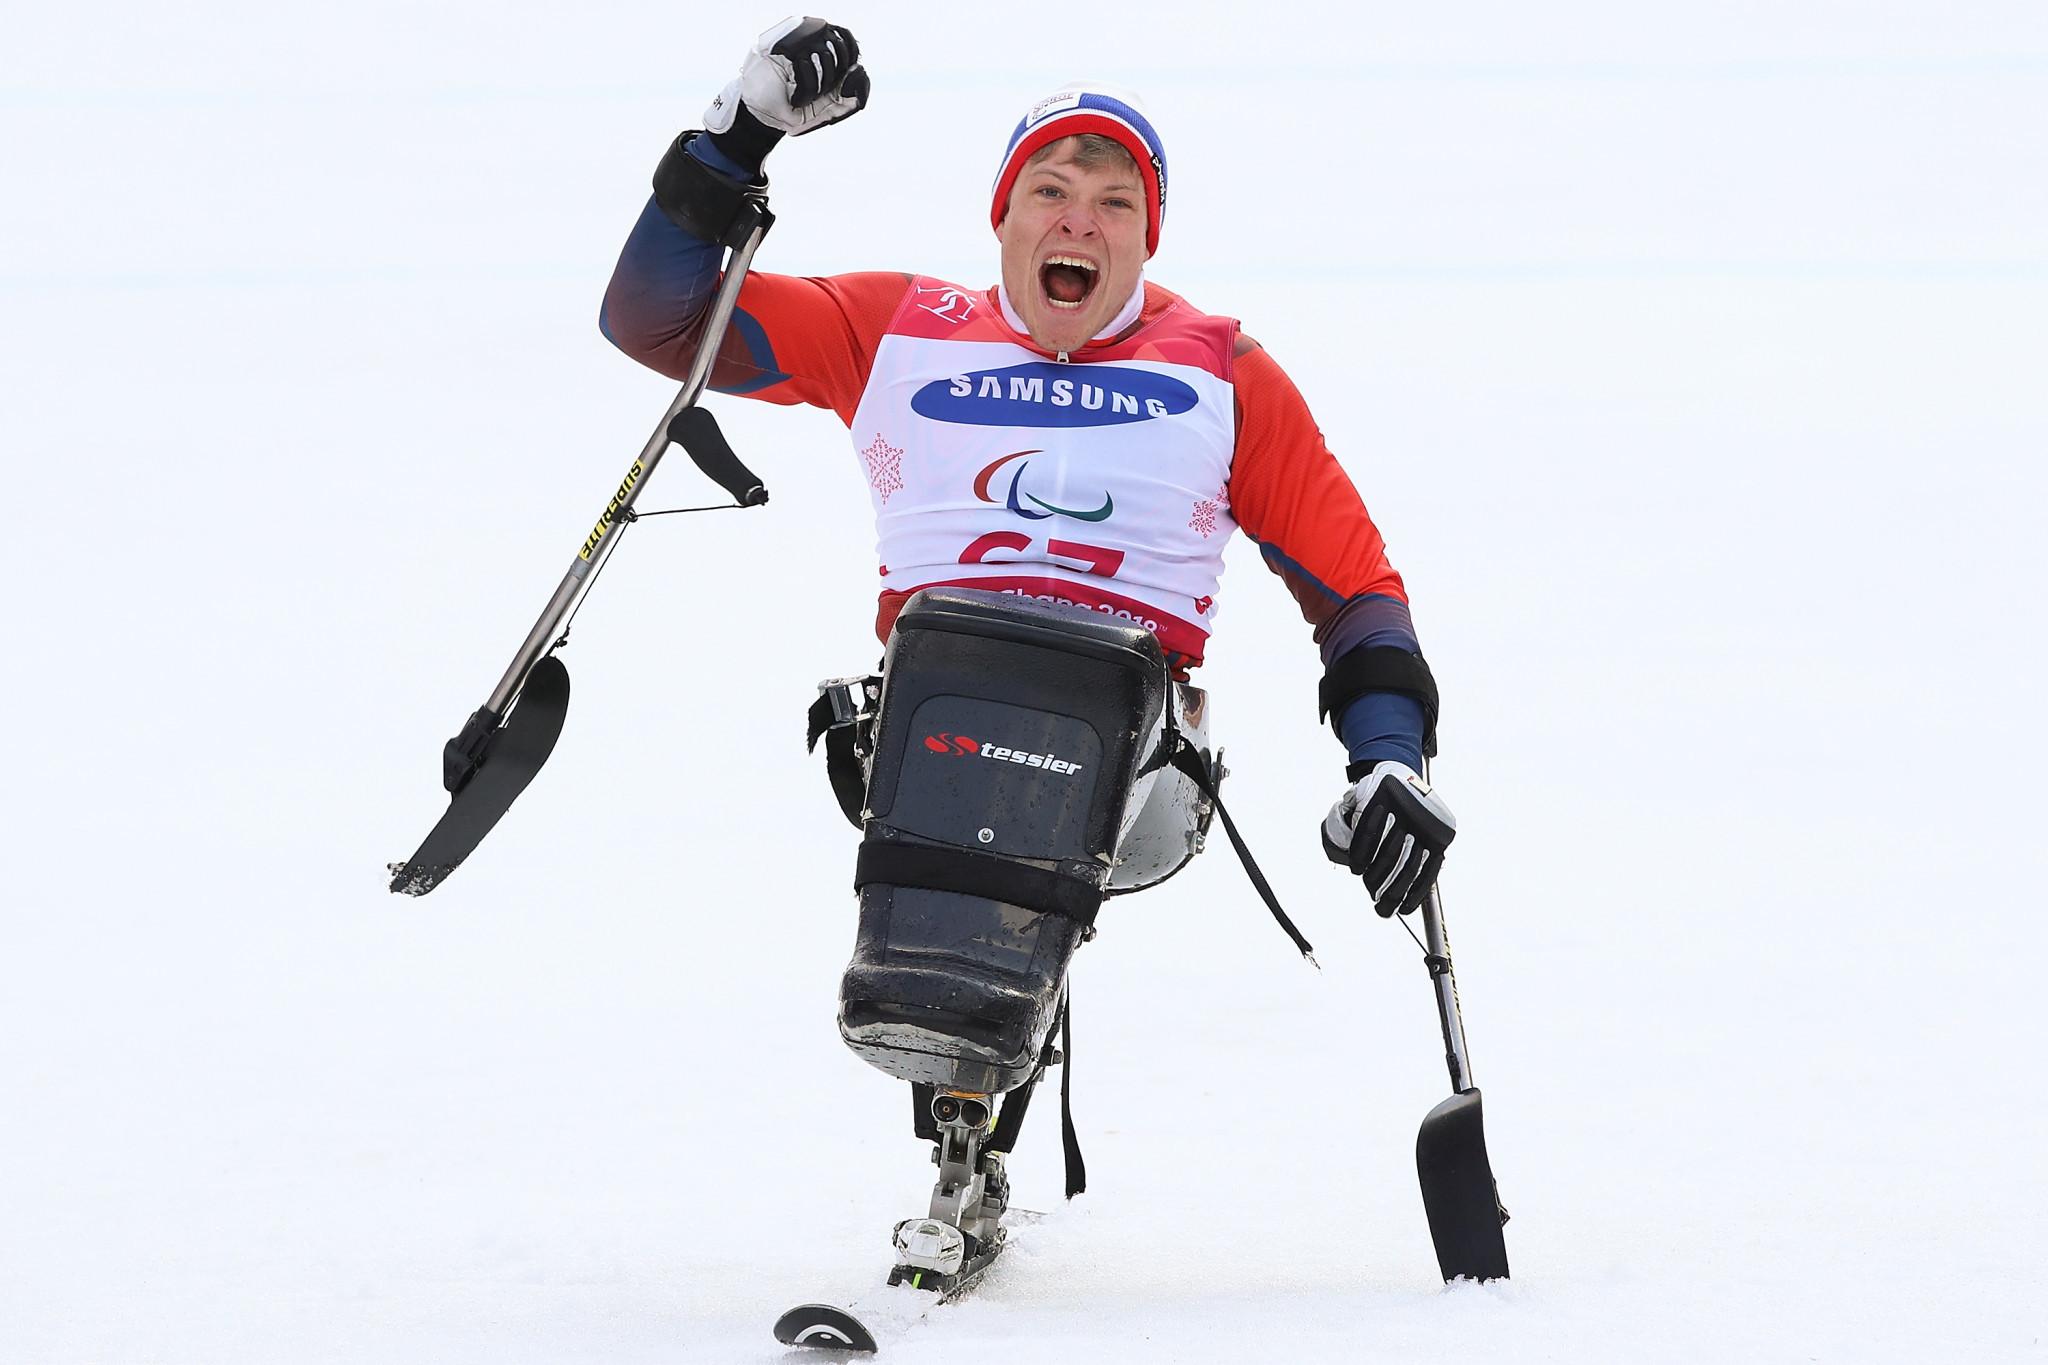 Norway's Jesper Pedersen won the second giant slalom men sitting race in Austria ©Getty Images